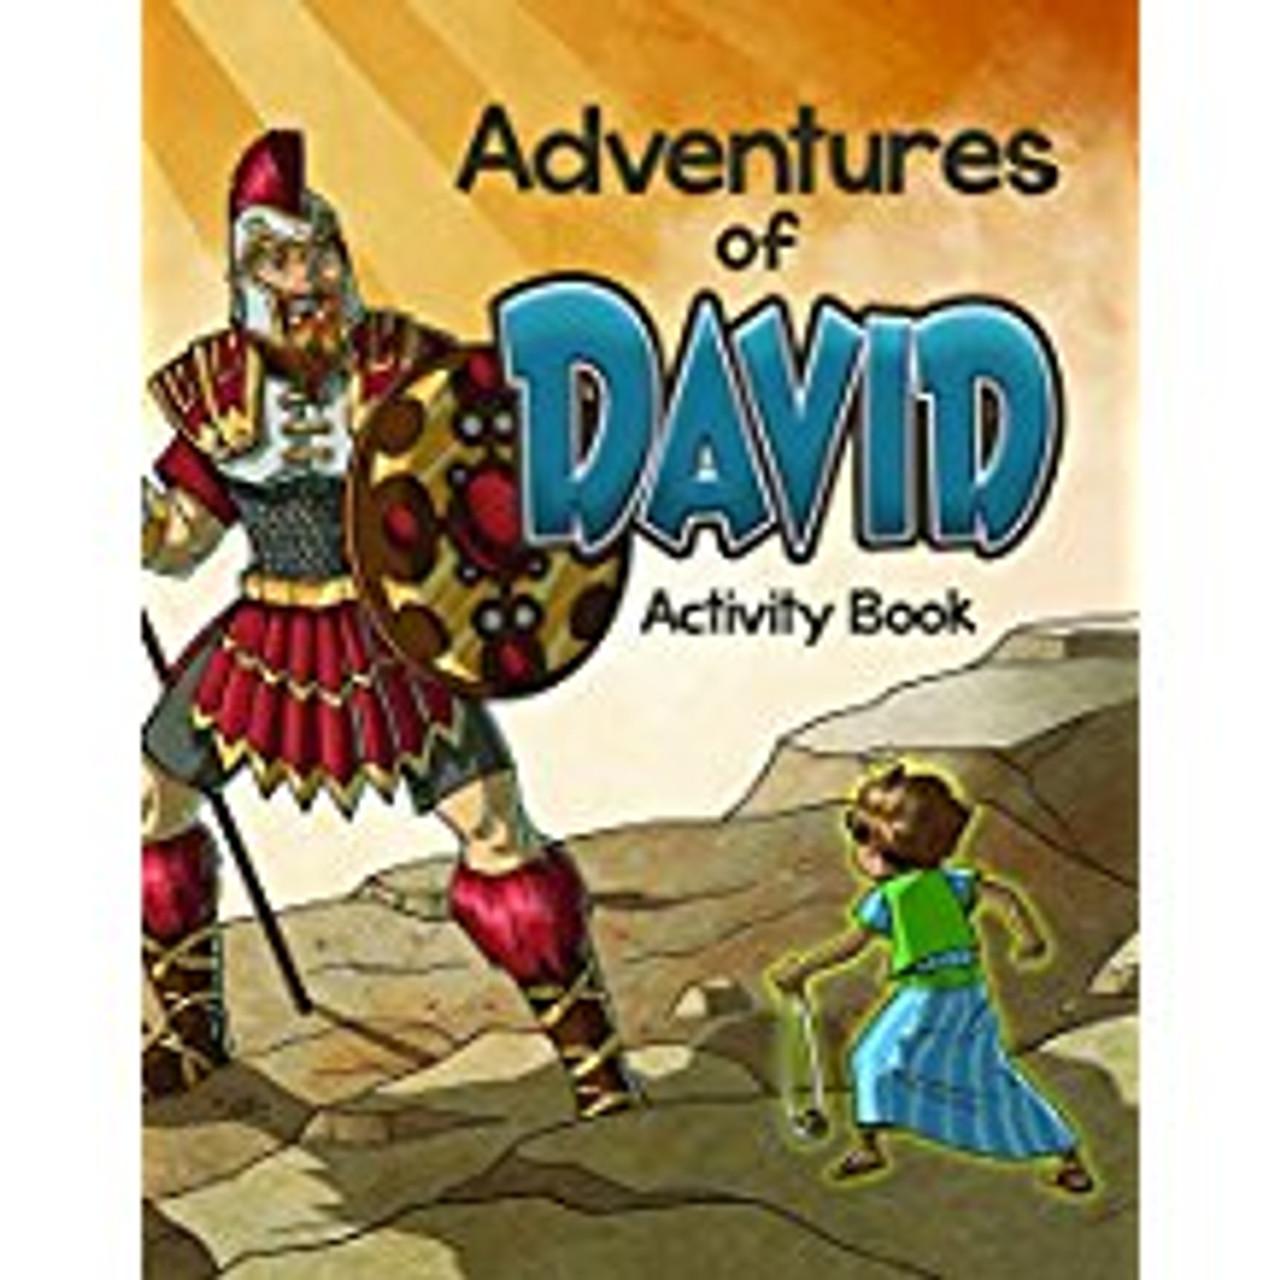 Coloring Activity Book - Adventures of David